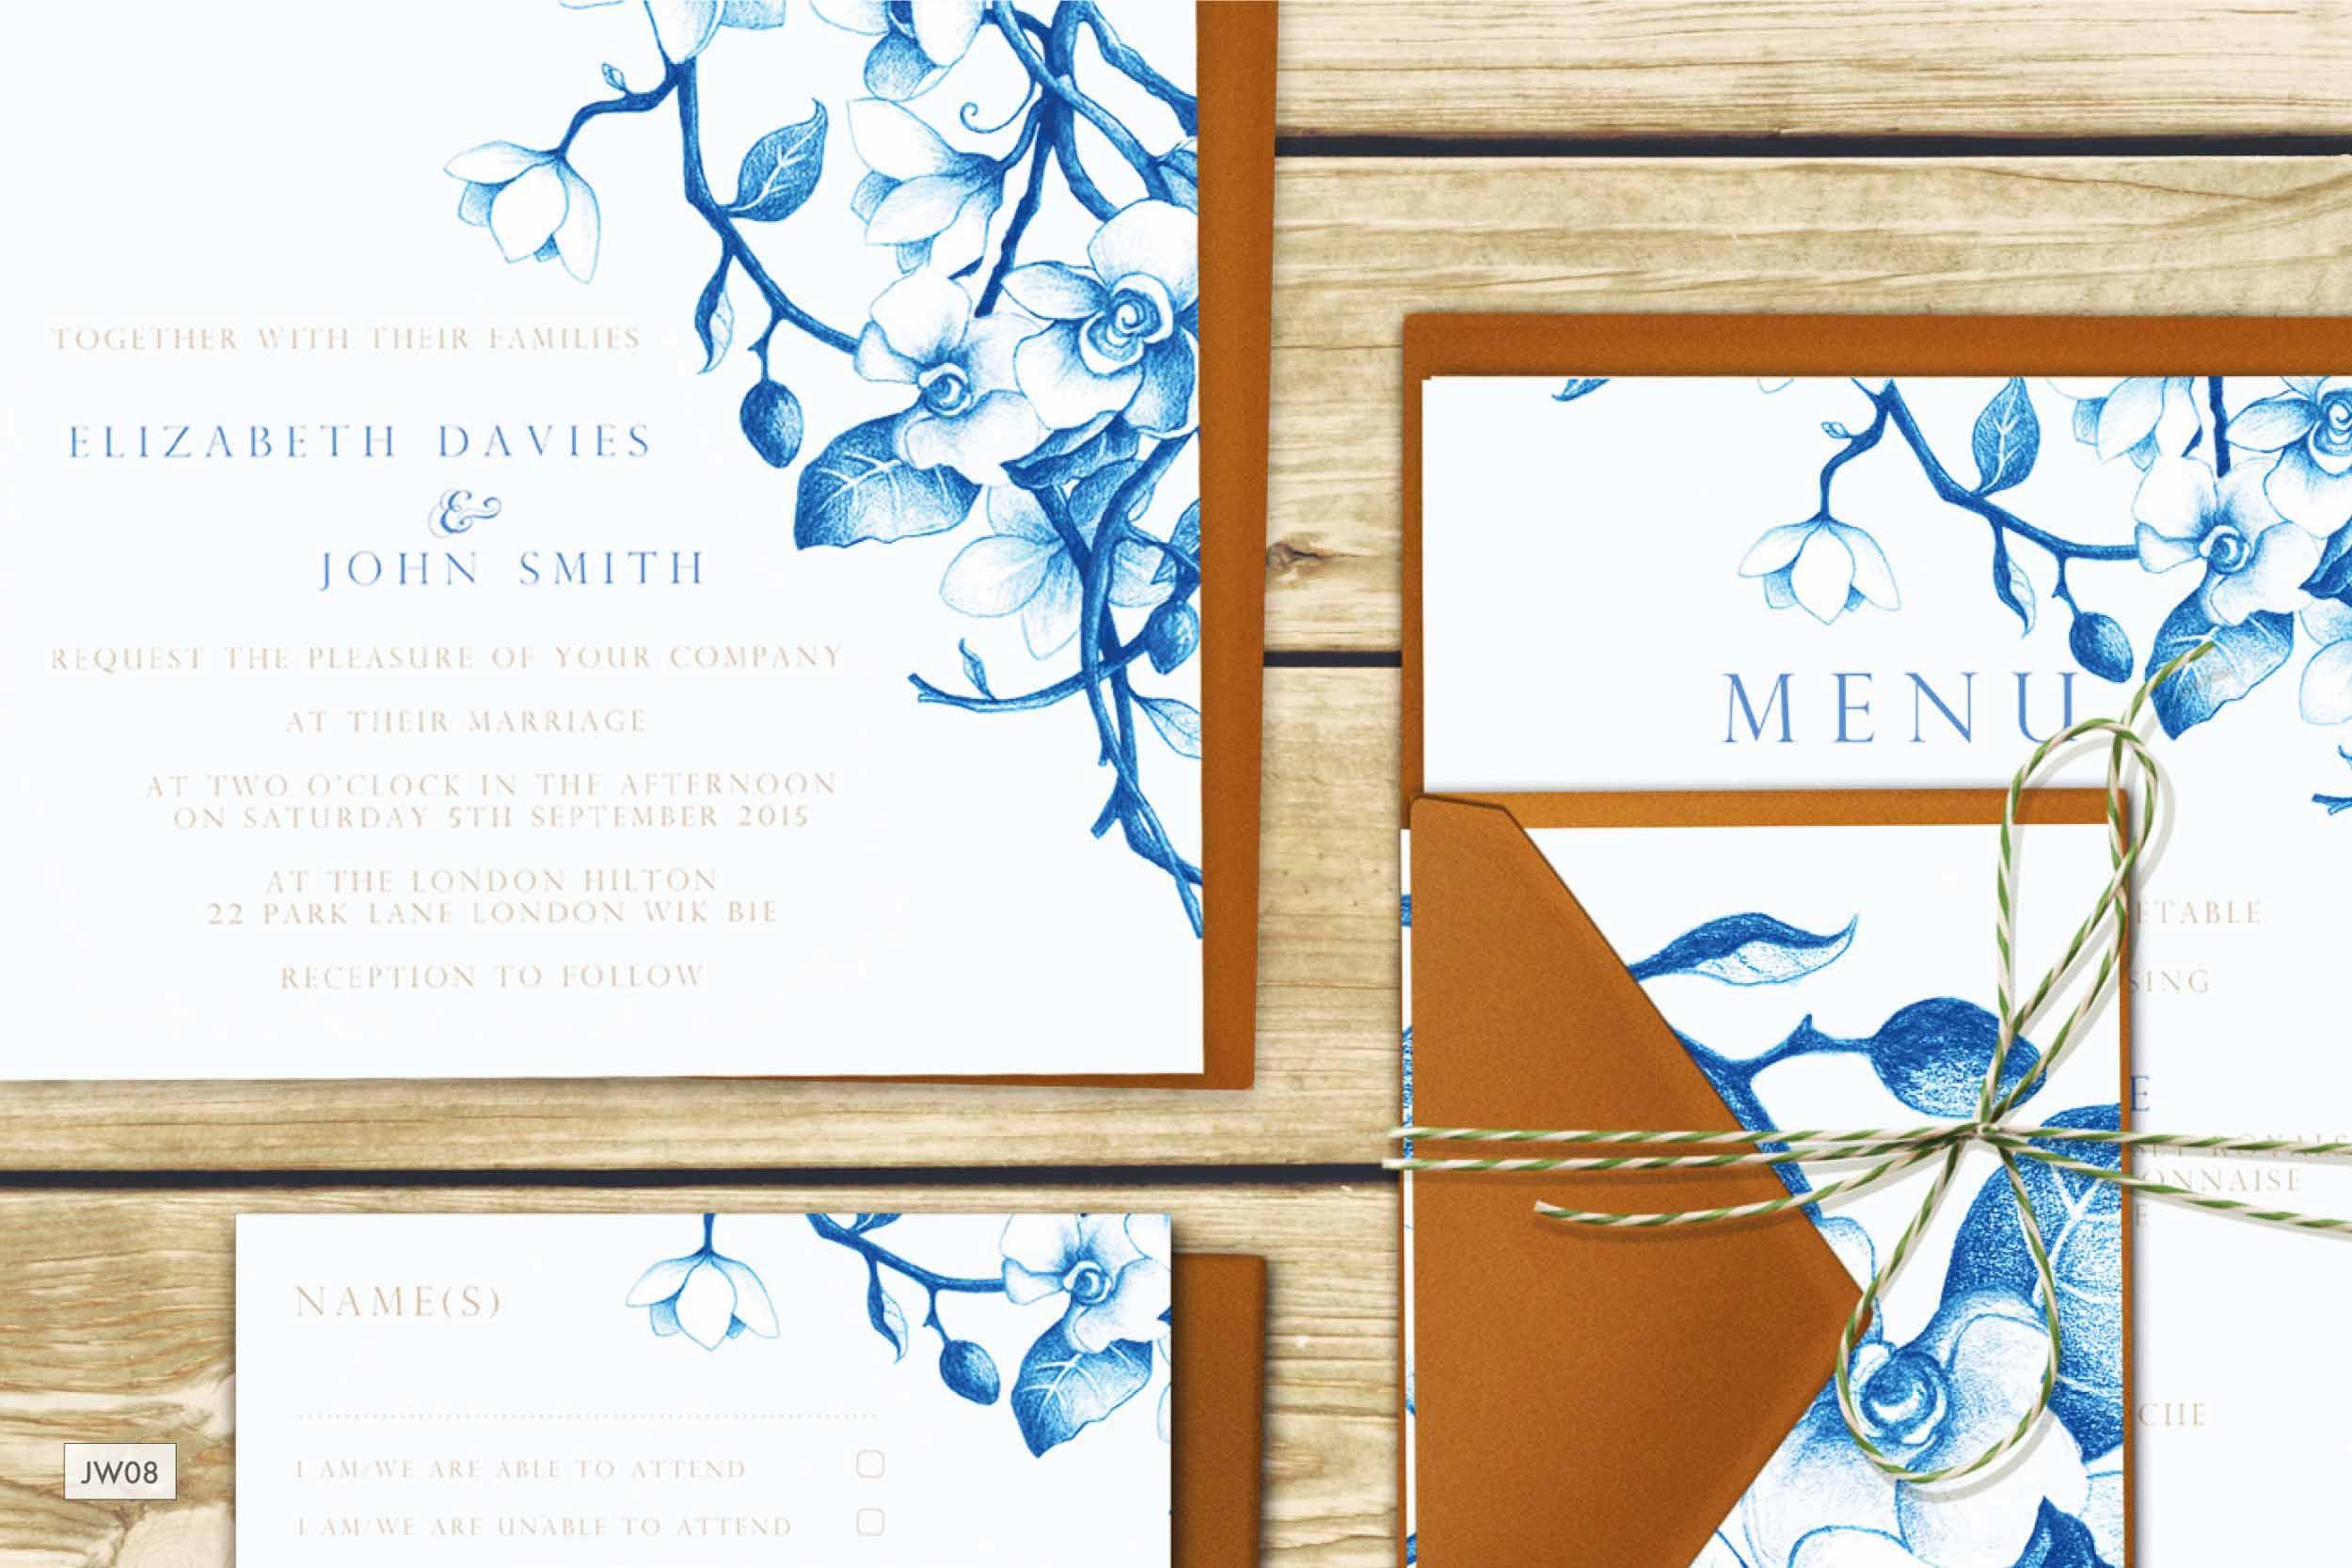 blue_orchid_stationery_jersey-weddings_ananyacards.com-02.jpg